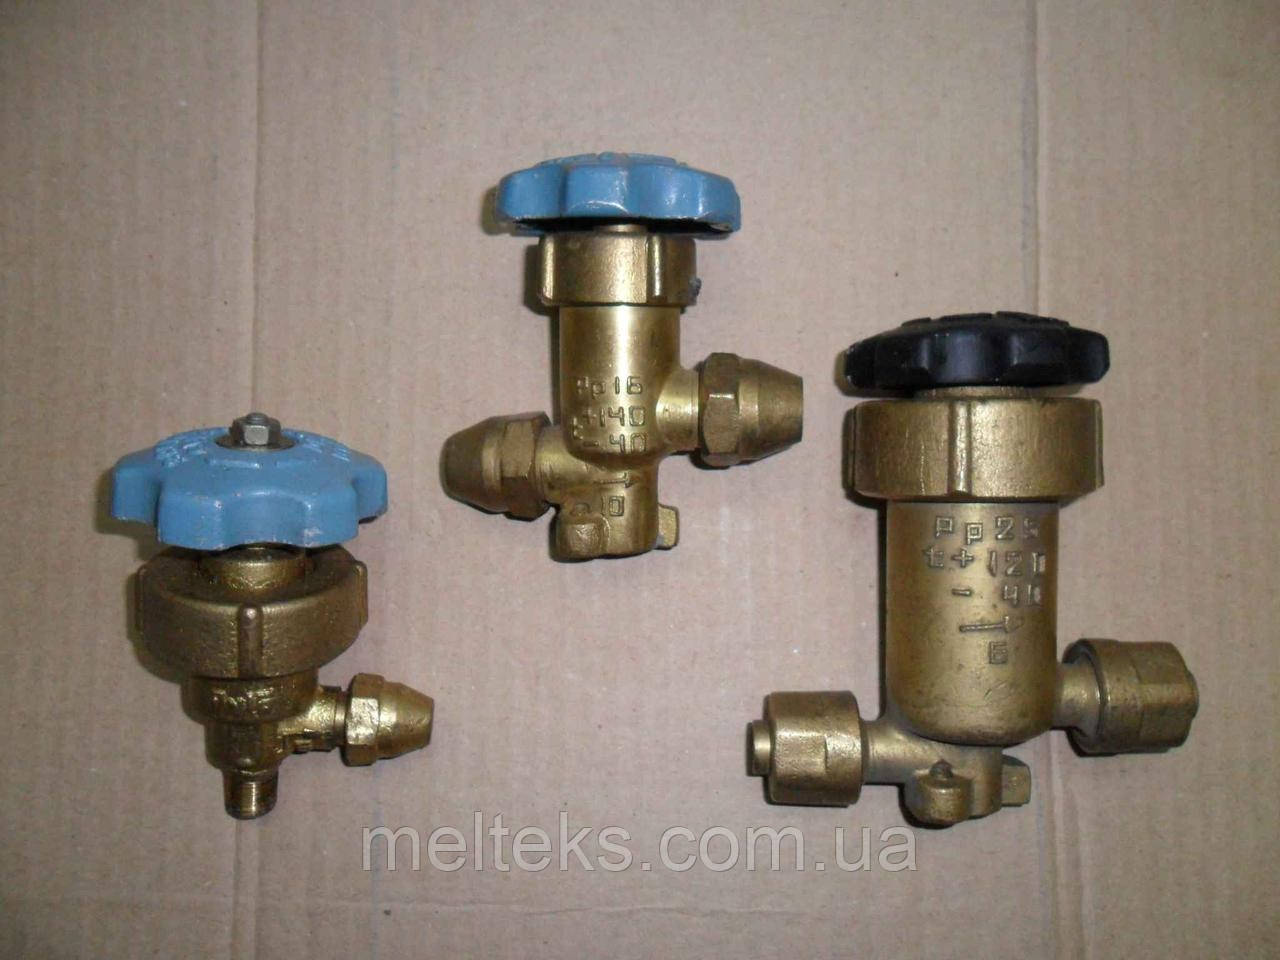 Вентиль клапан УФ26055 (-56), УФ29044 (-49), 22Б16п, 15Б34бк